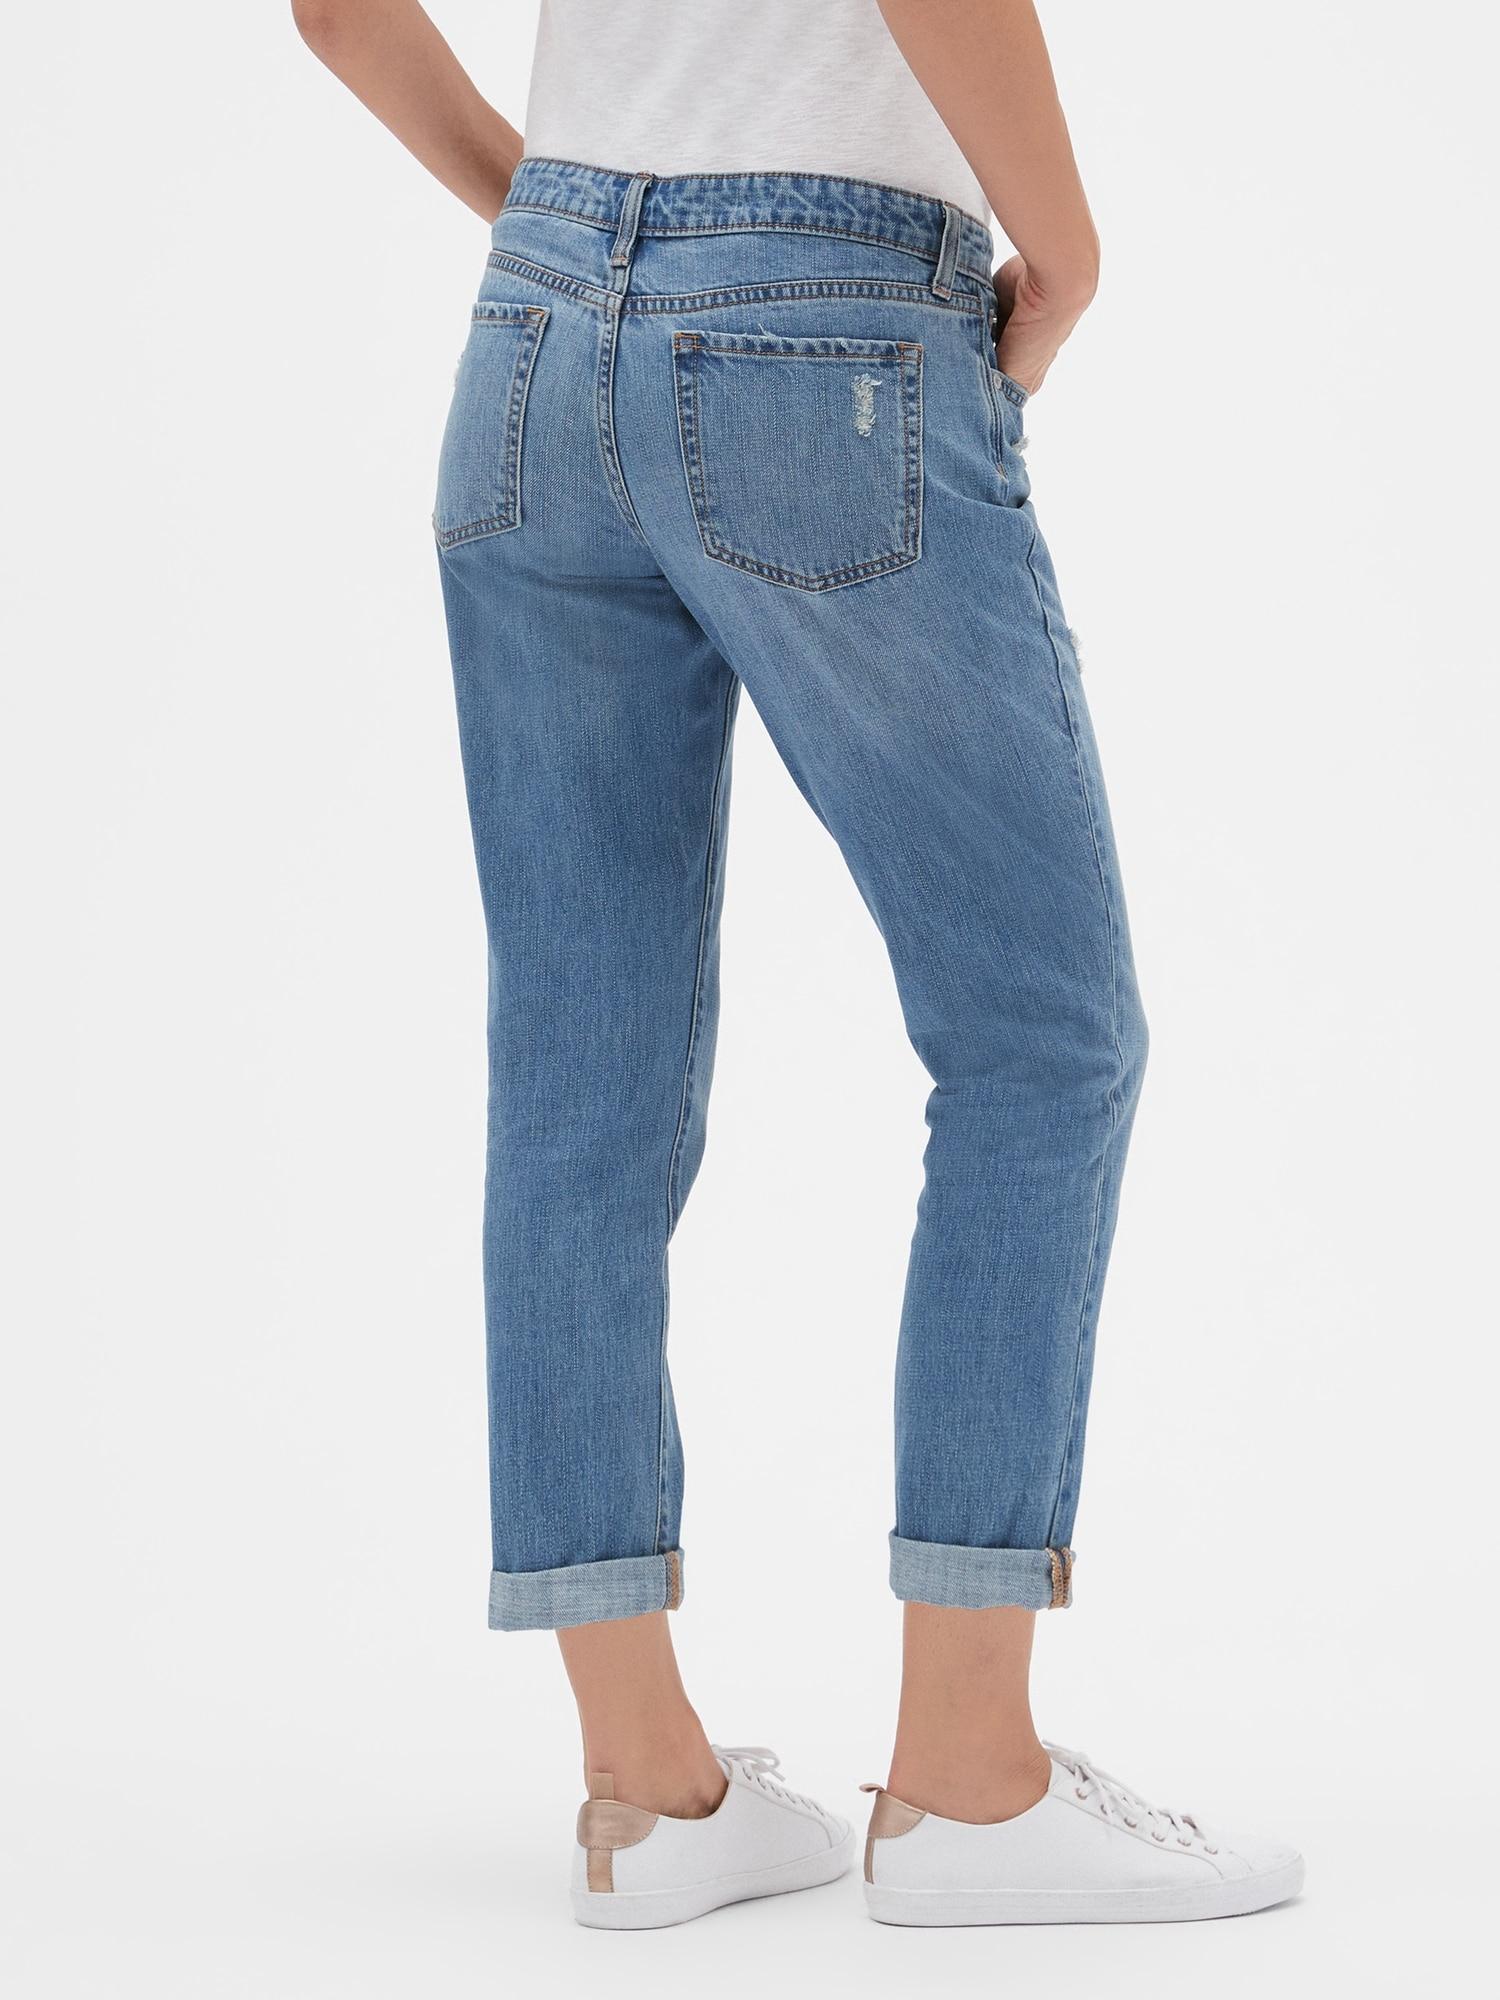 Girlfriend jeans vs boyfriend jeans, boyfriend jeans fit, baxk